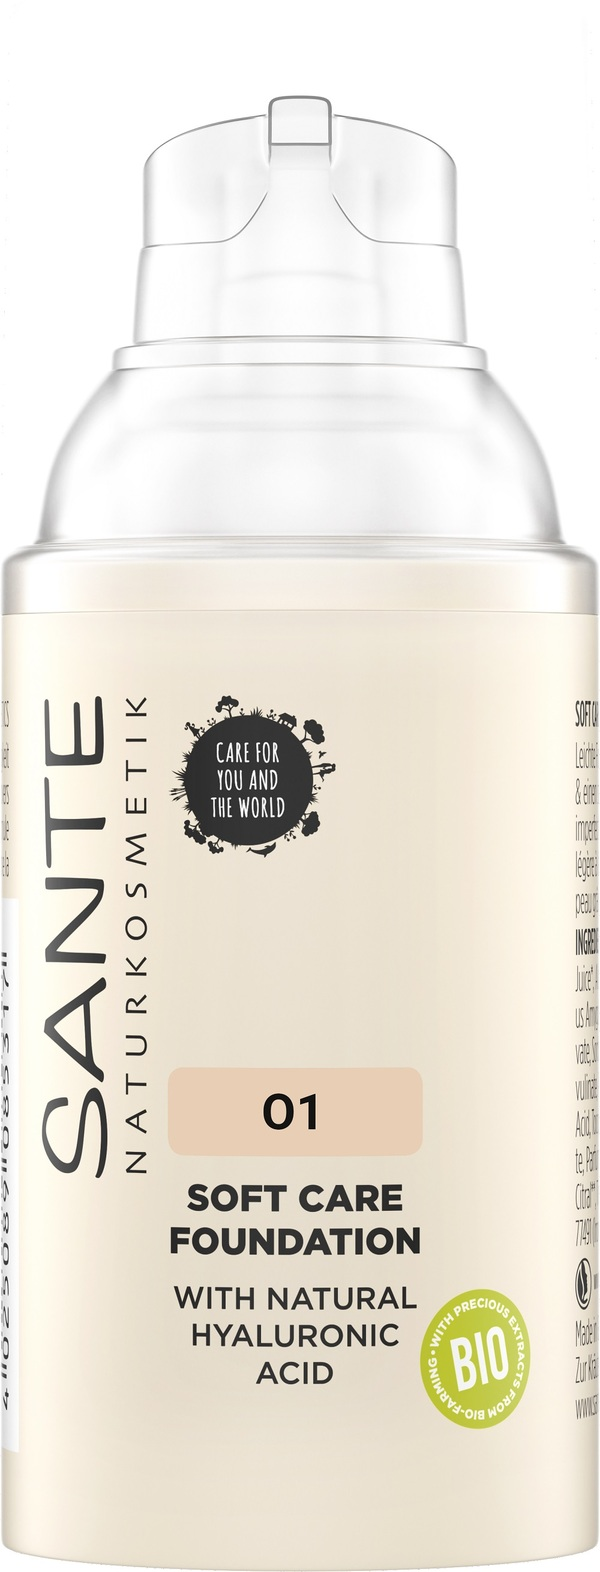 Sante Naturkosmetik - Fond de teint Crème - Warm Linen 01